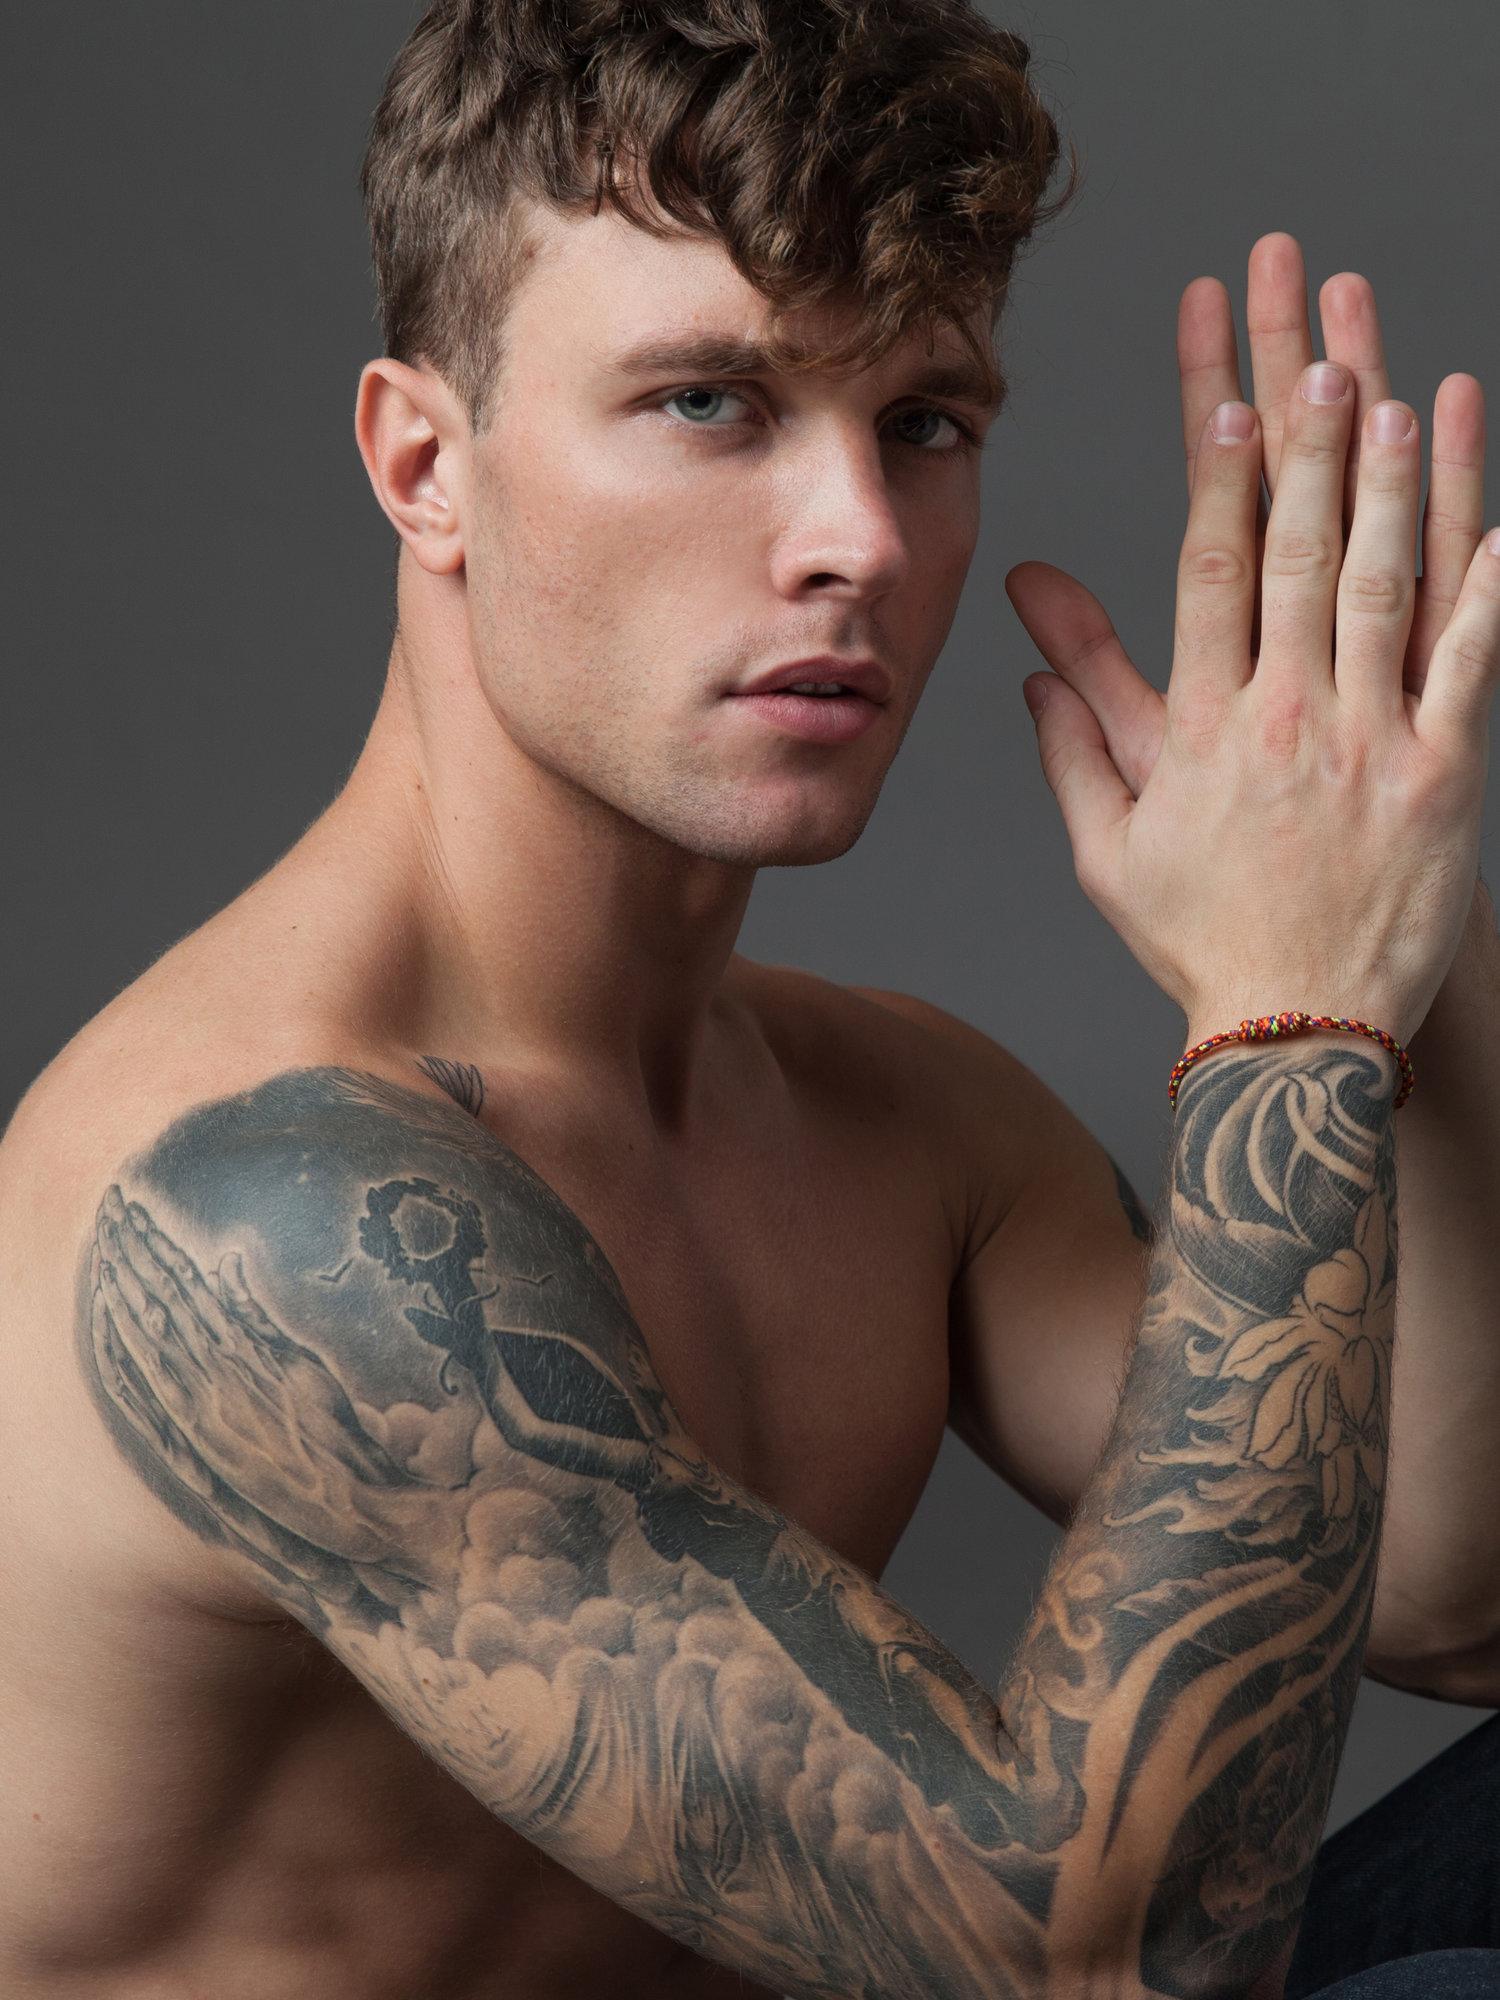 Adon Exclusive: Model Antoni Bialy By Valeria Selezneva